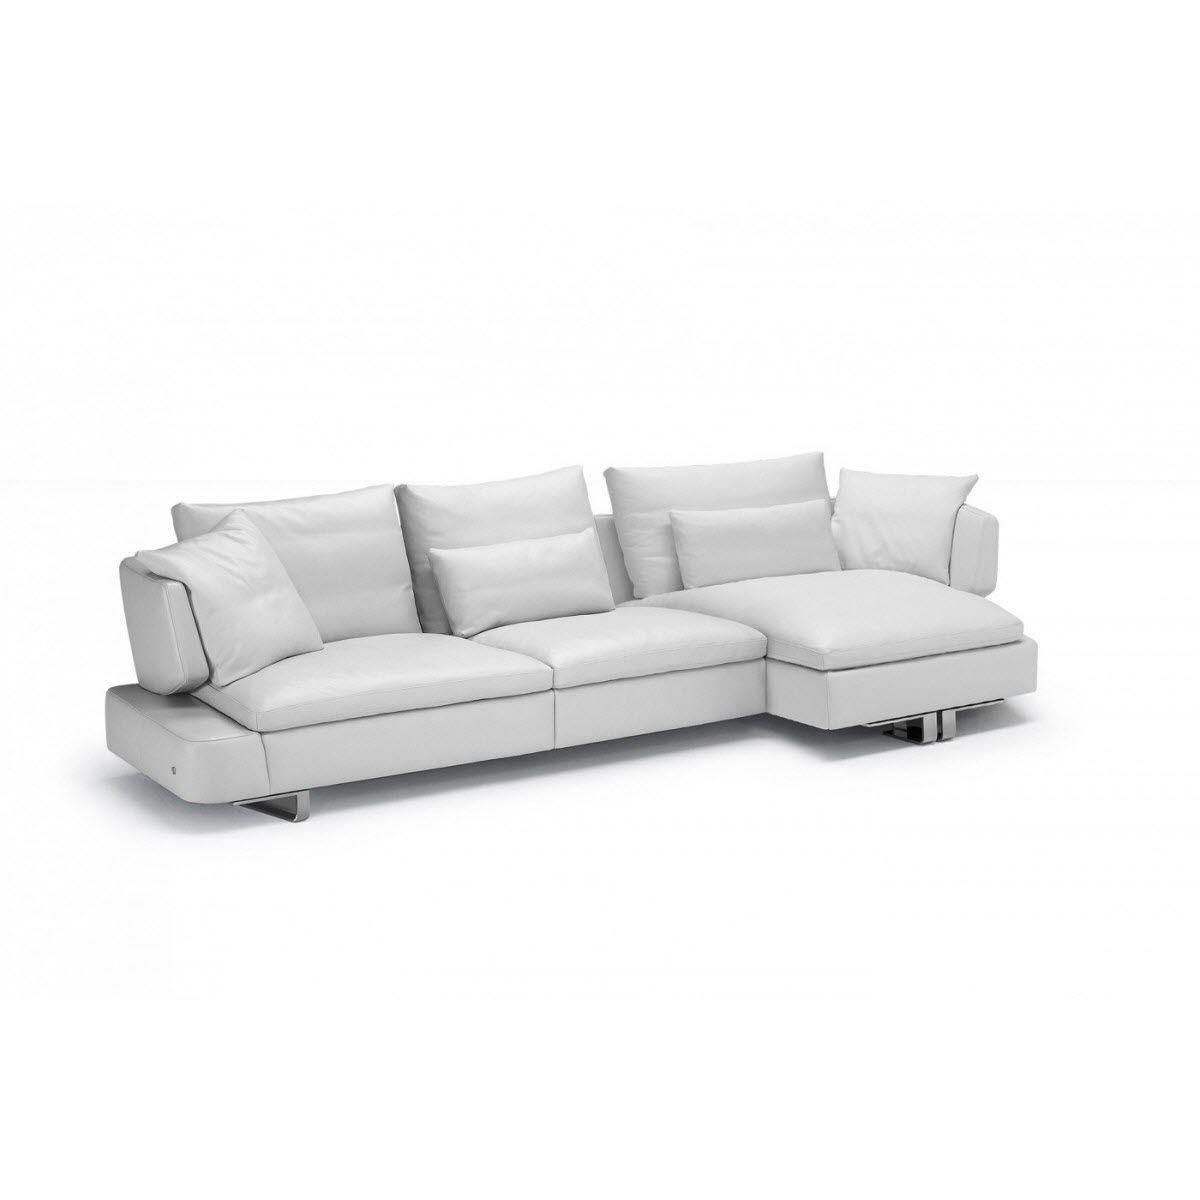 Amazing Modular Sofa Contemporary Leather Fabric Opus Natuzzi Alphanode Cool Chair Designs And Ideas Alphanodeonline